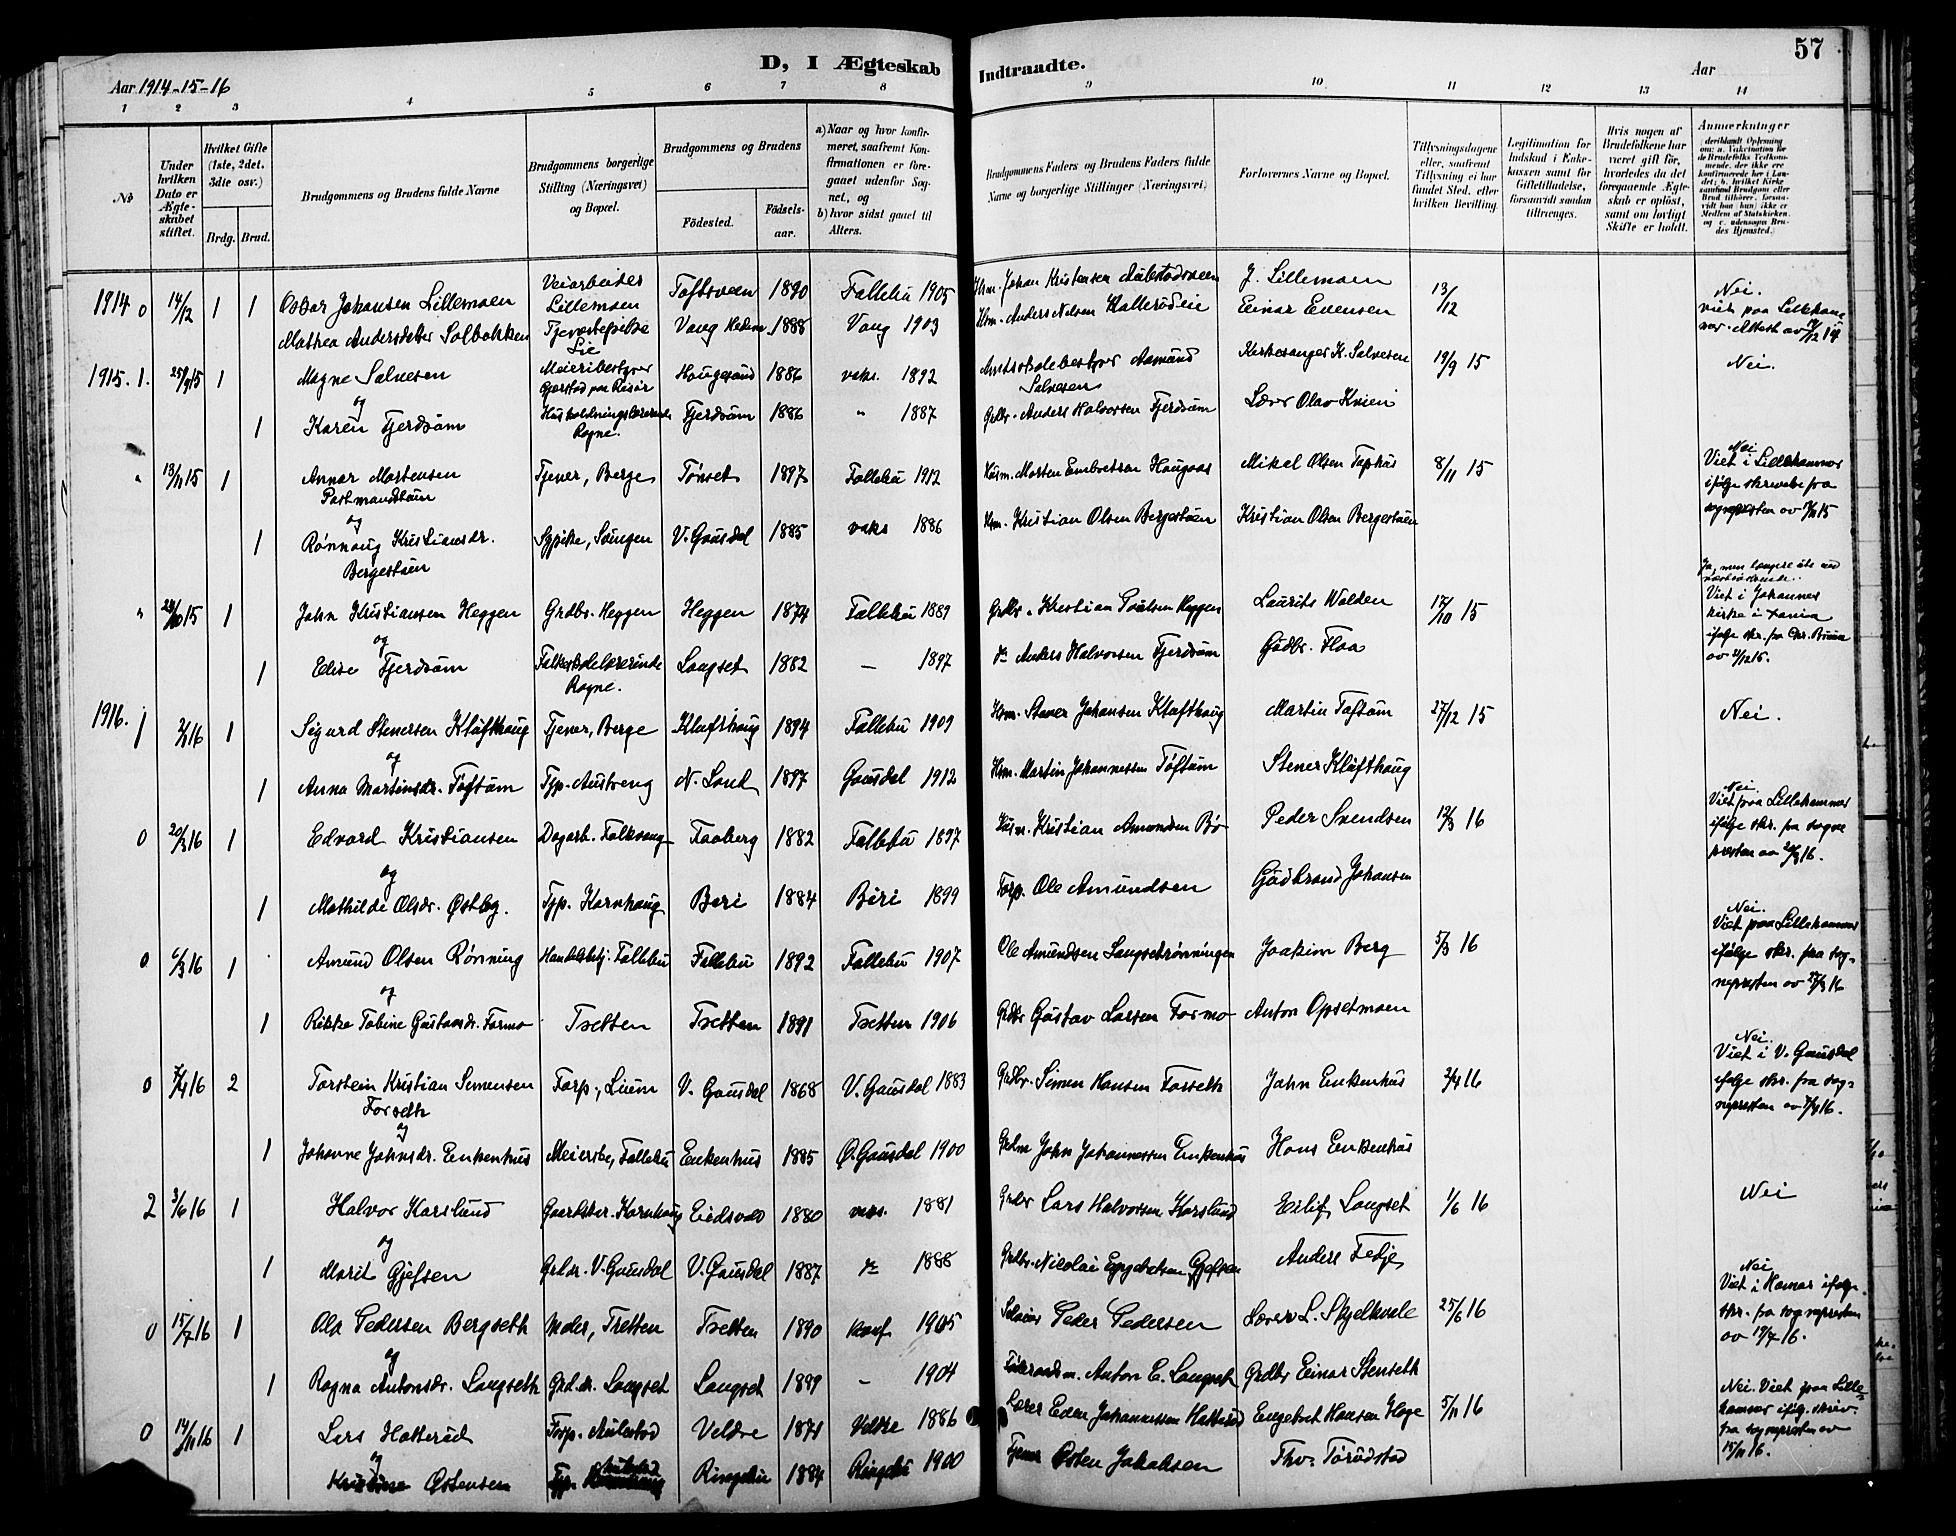 SAH, Østre Gausdal prestekontor, Klokkerbok nr. 3, 1894-1915, s. 57